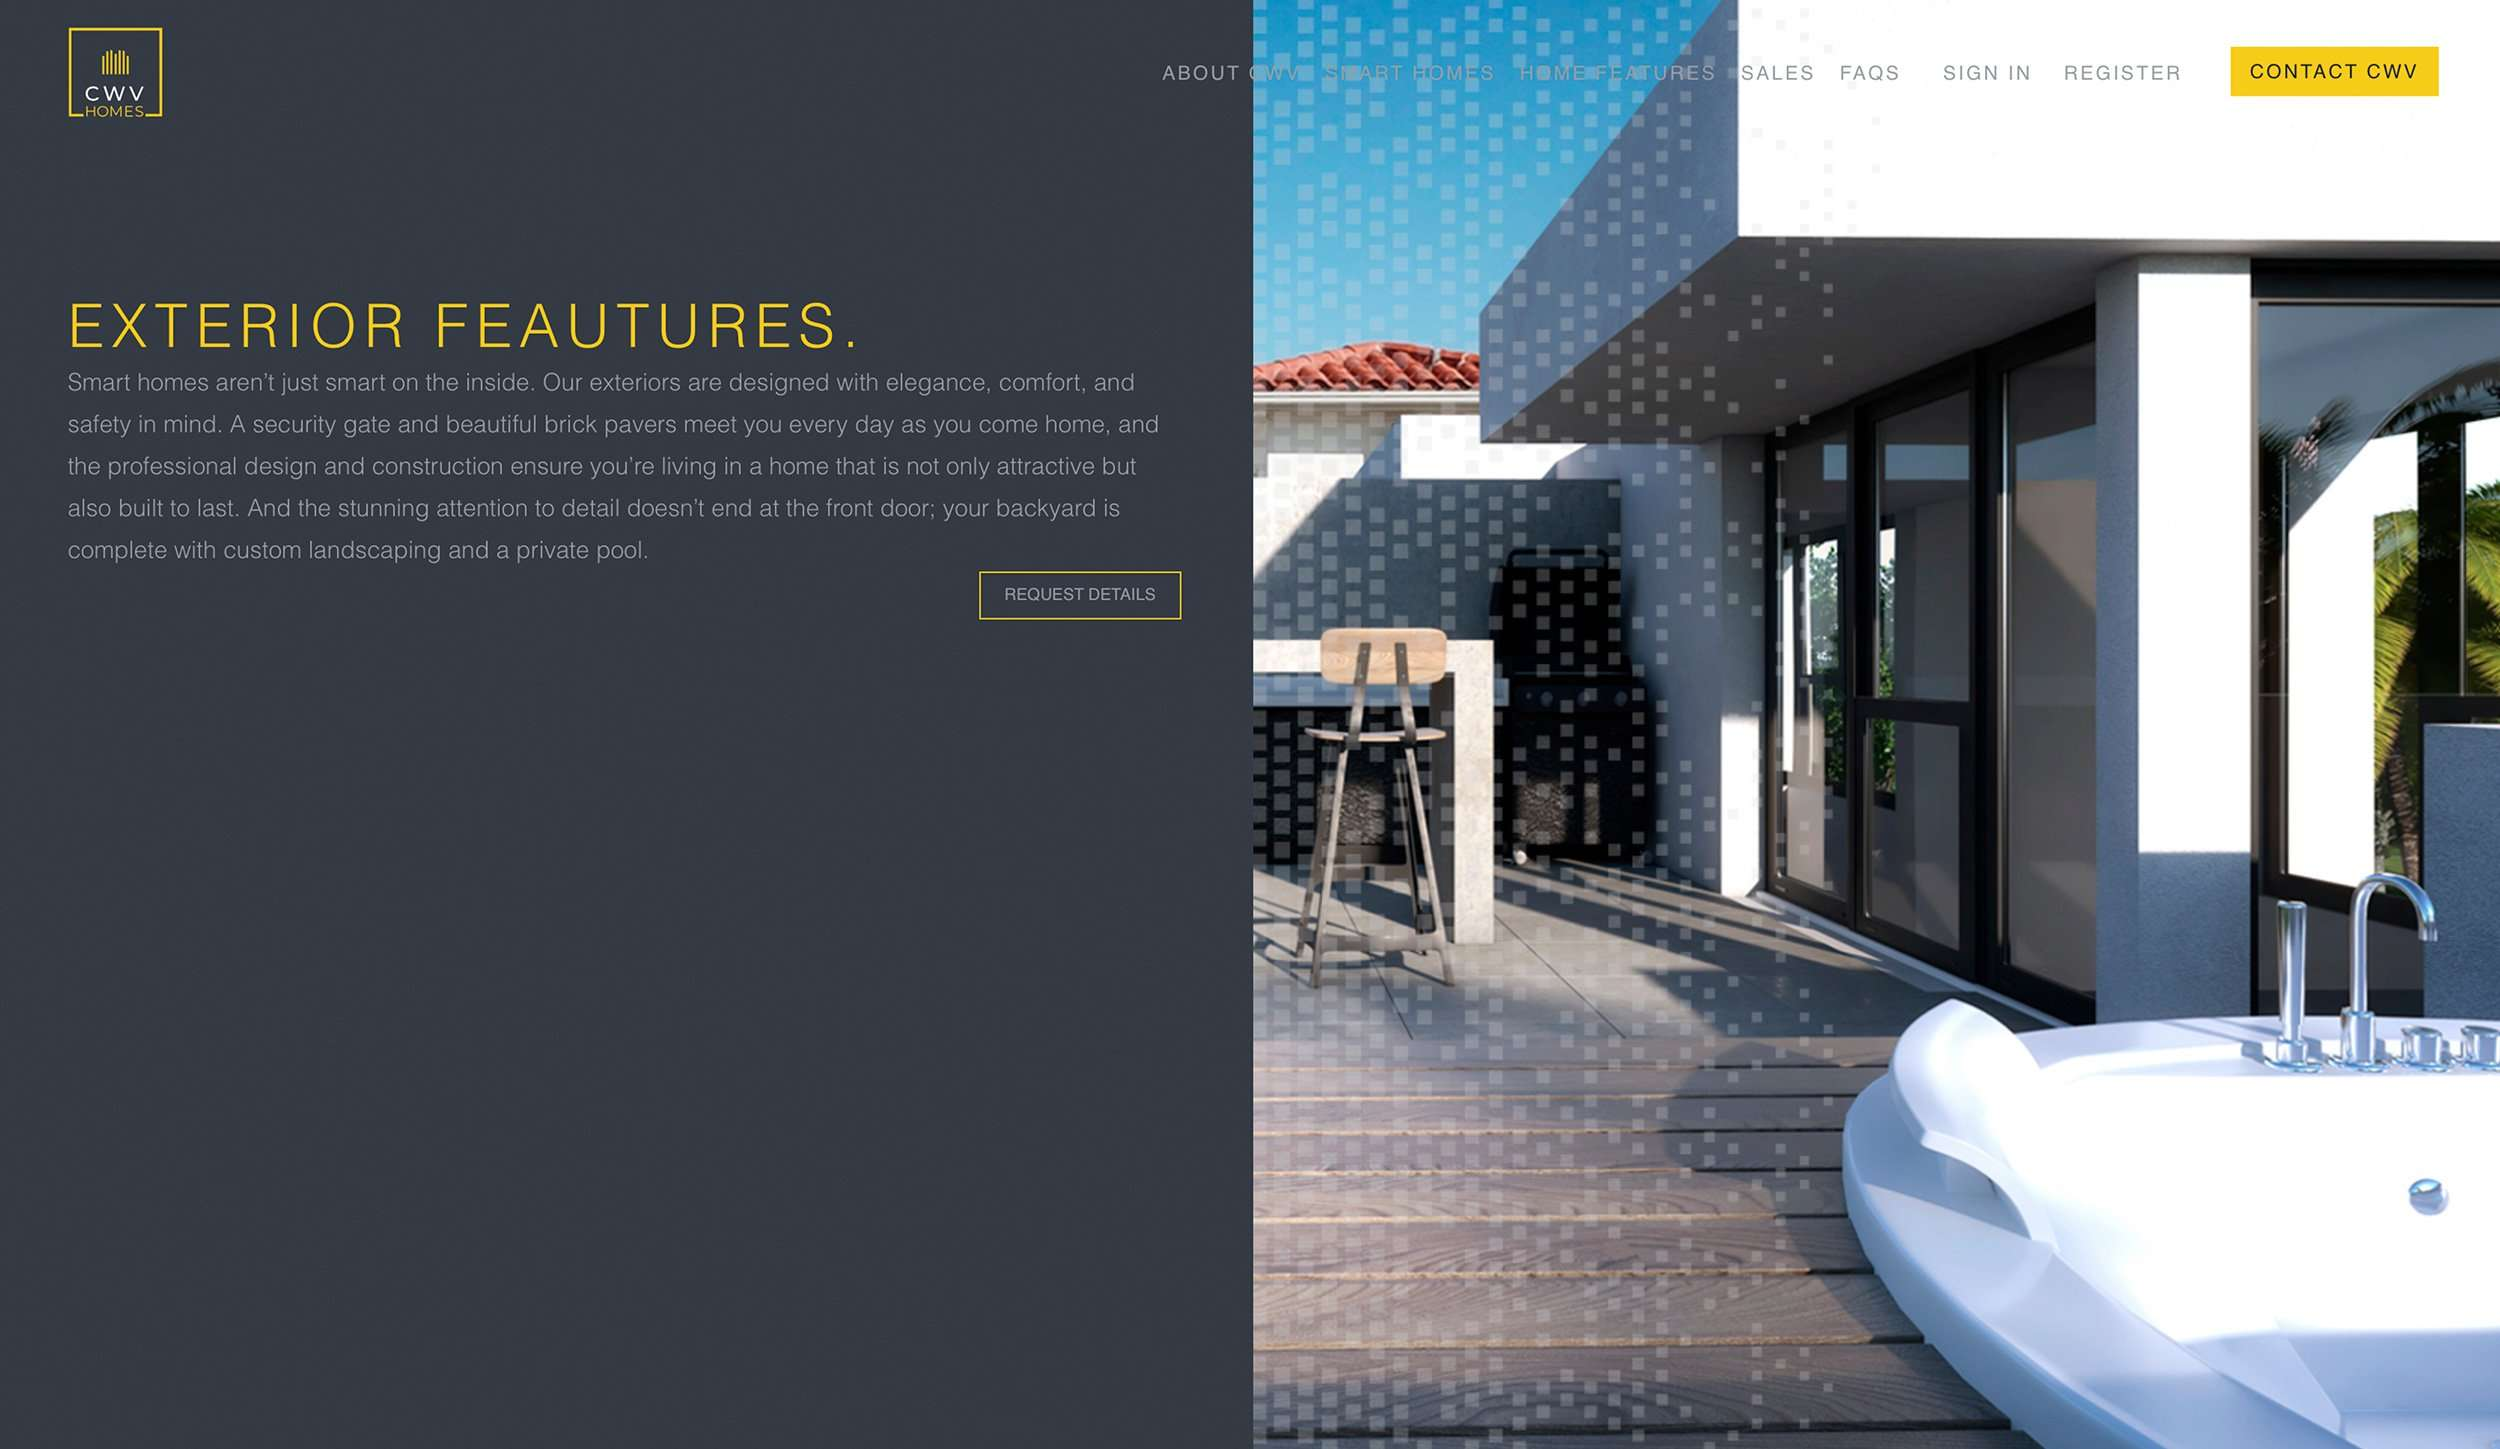 cwv-group-miami-usa-estados-unidos-real-estate-online-lab-lisbon-web-development-web-design-18